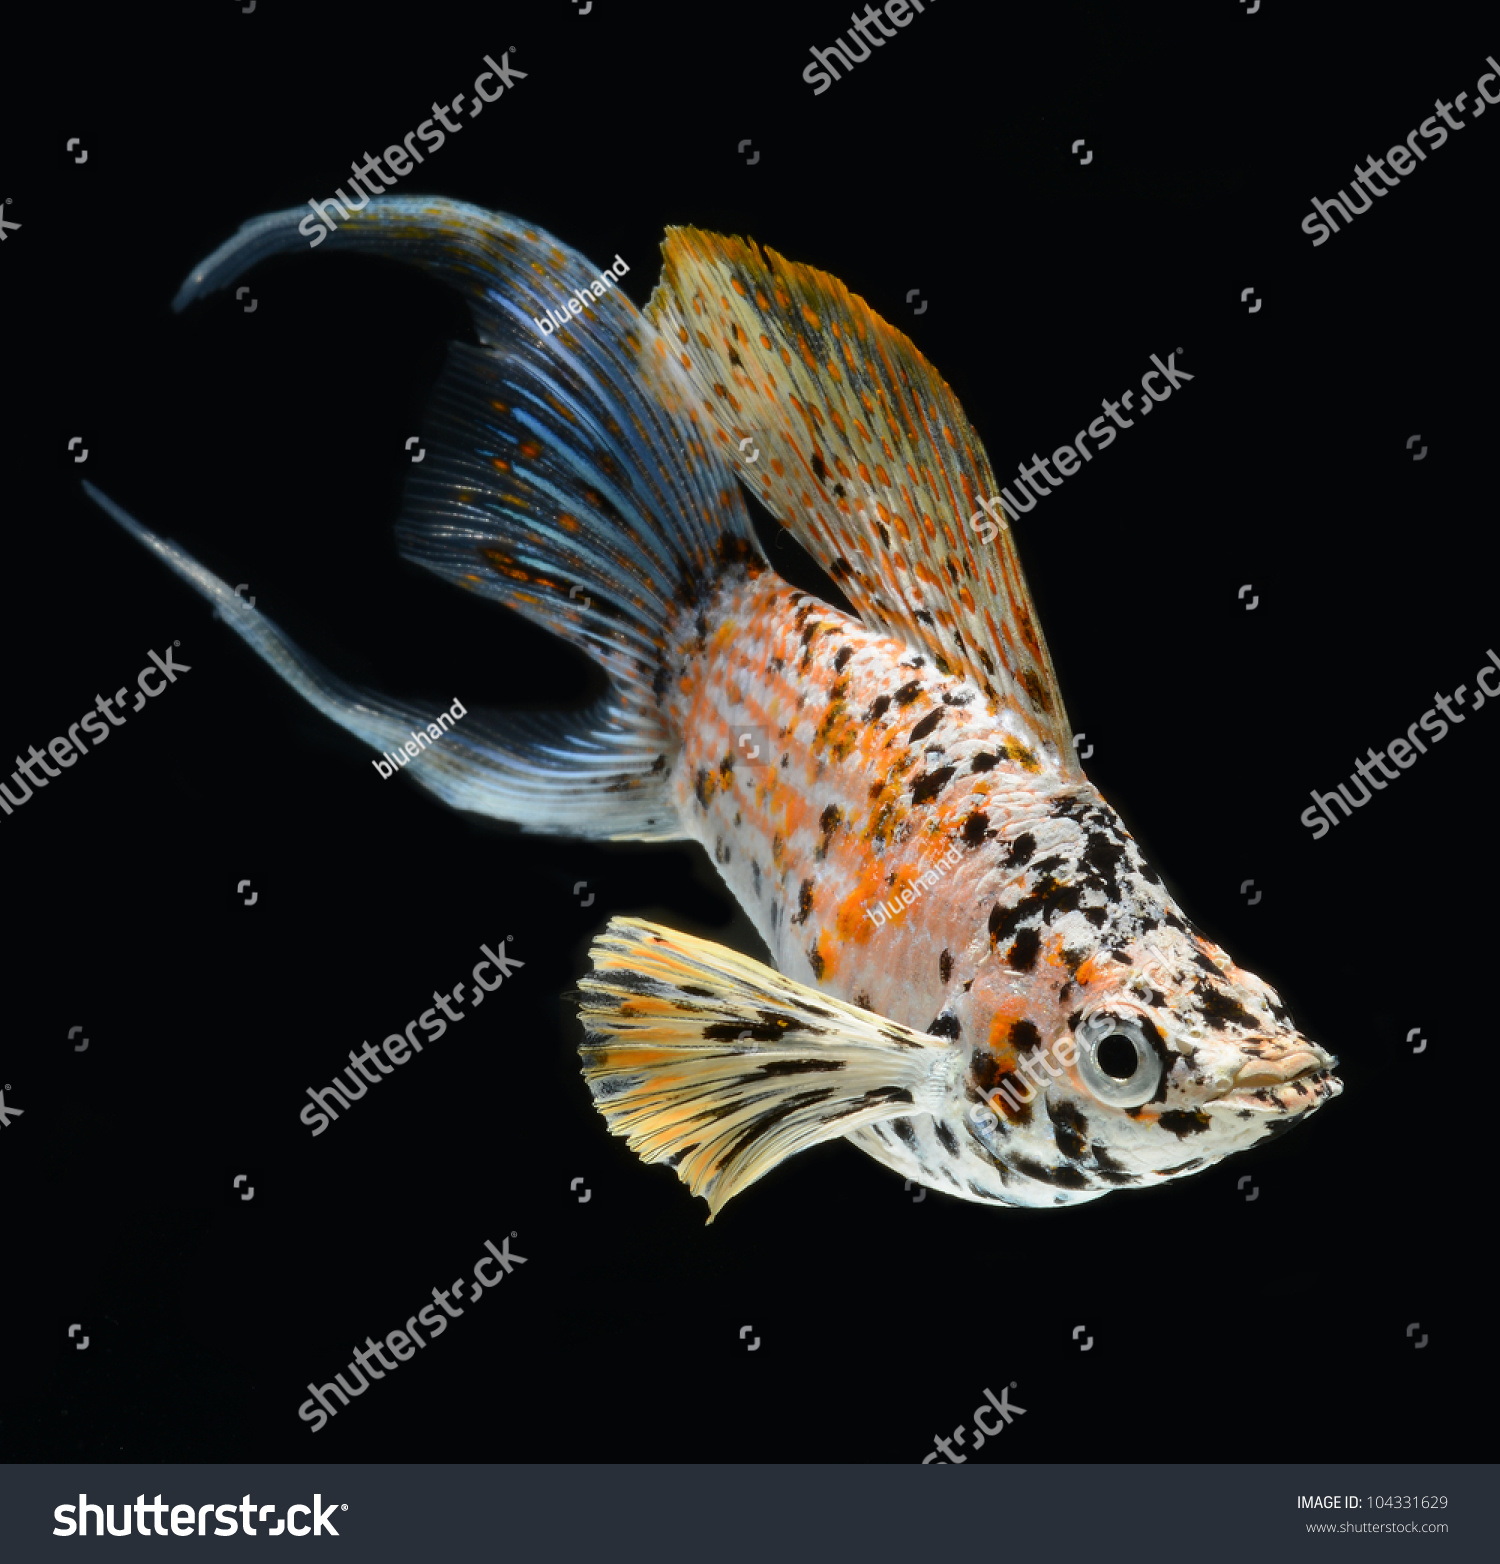 Molly Fish Isolated On Black Background Stock Photo - Image: 52348128